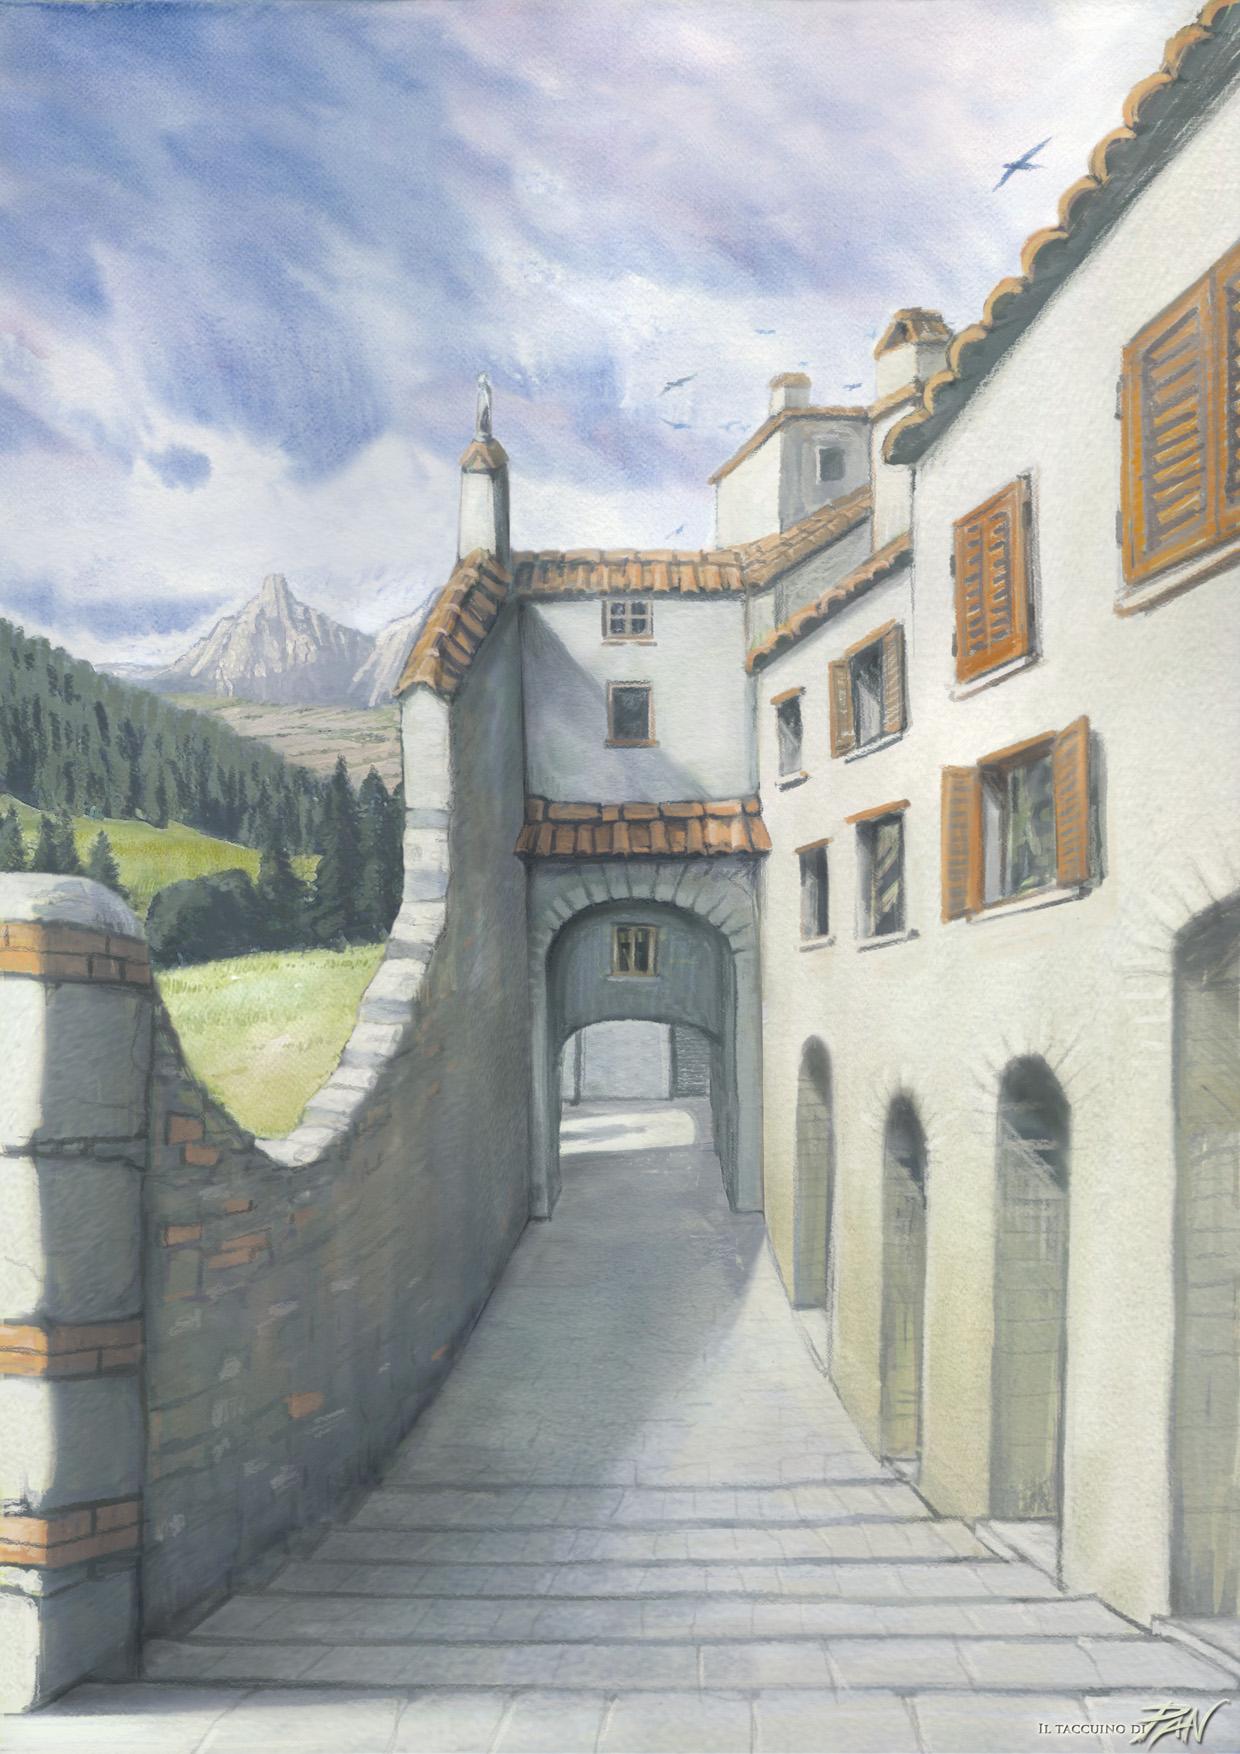 Oltre il Muro by Panaiotis